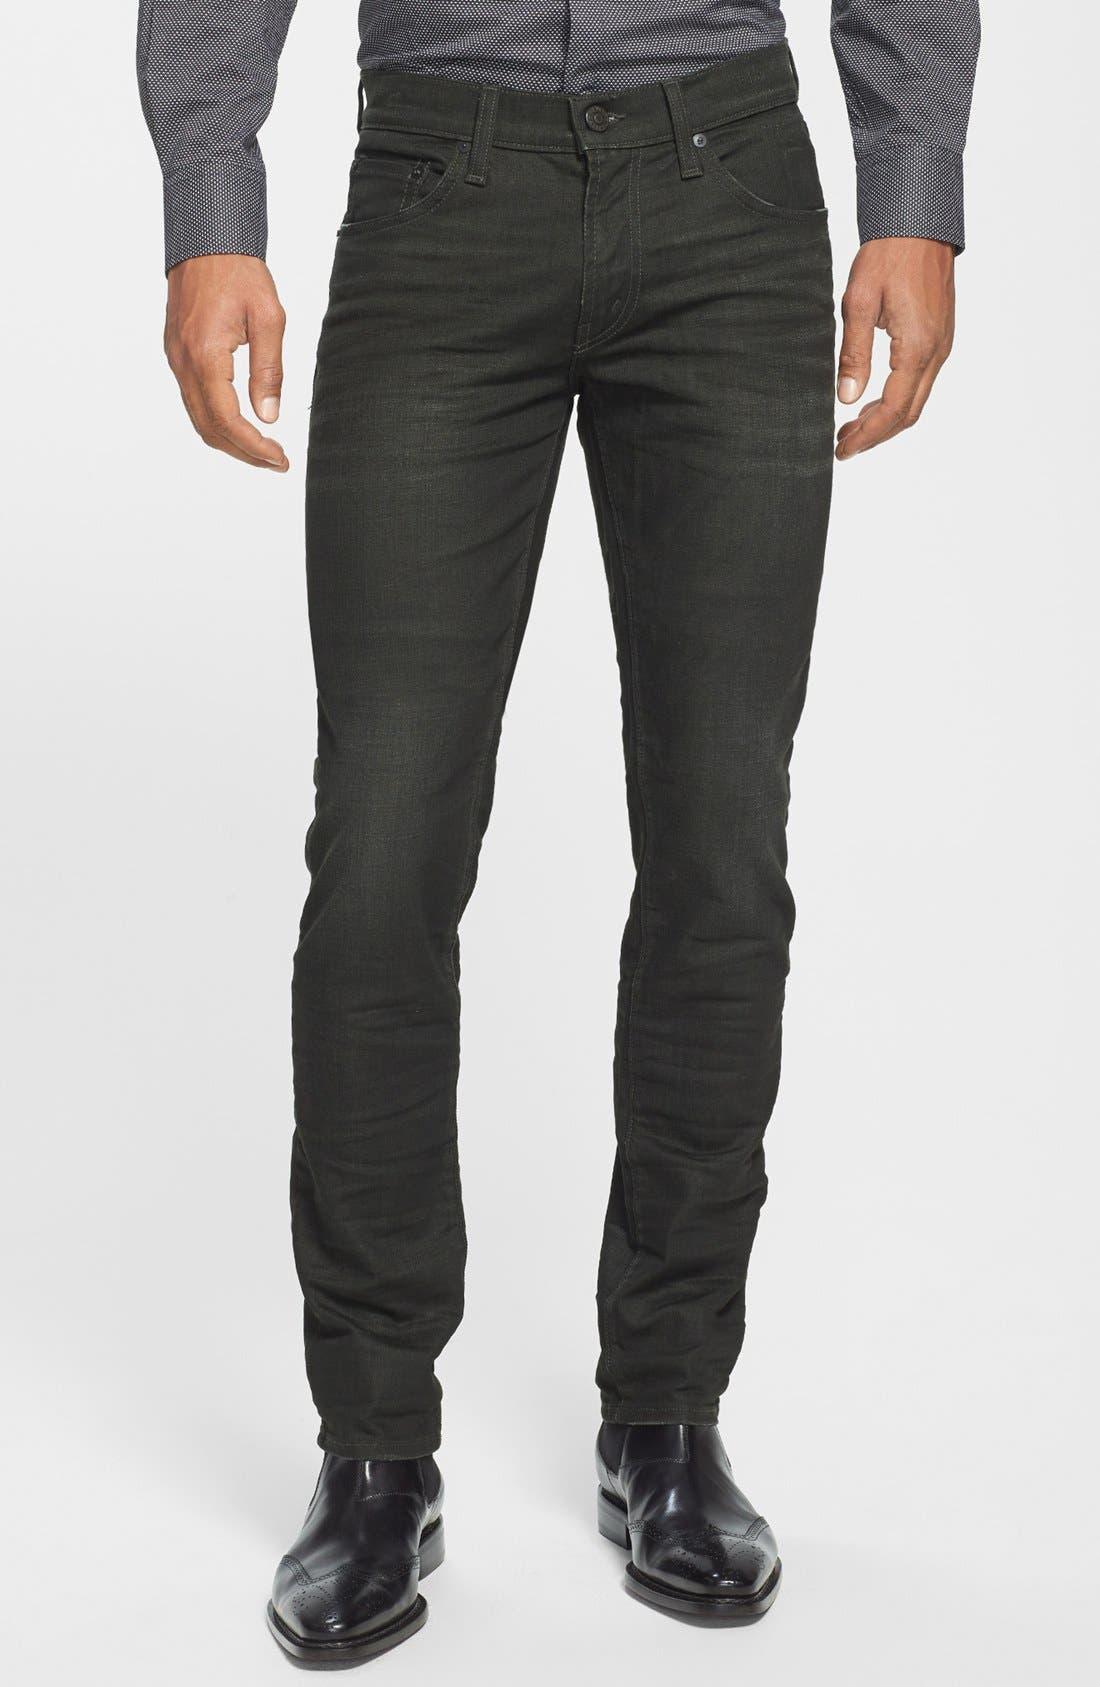 Main Image - J Brand 'Mick' Skinny Fit Jeans (Arcane)